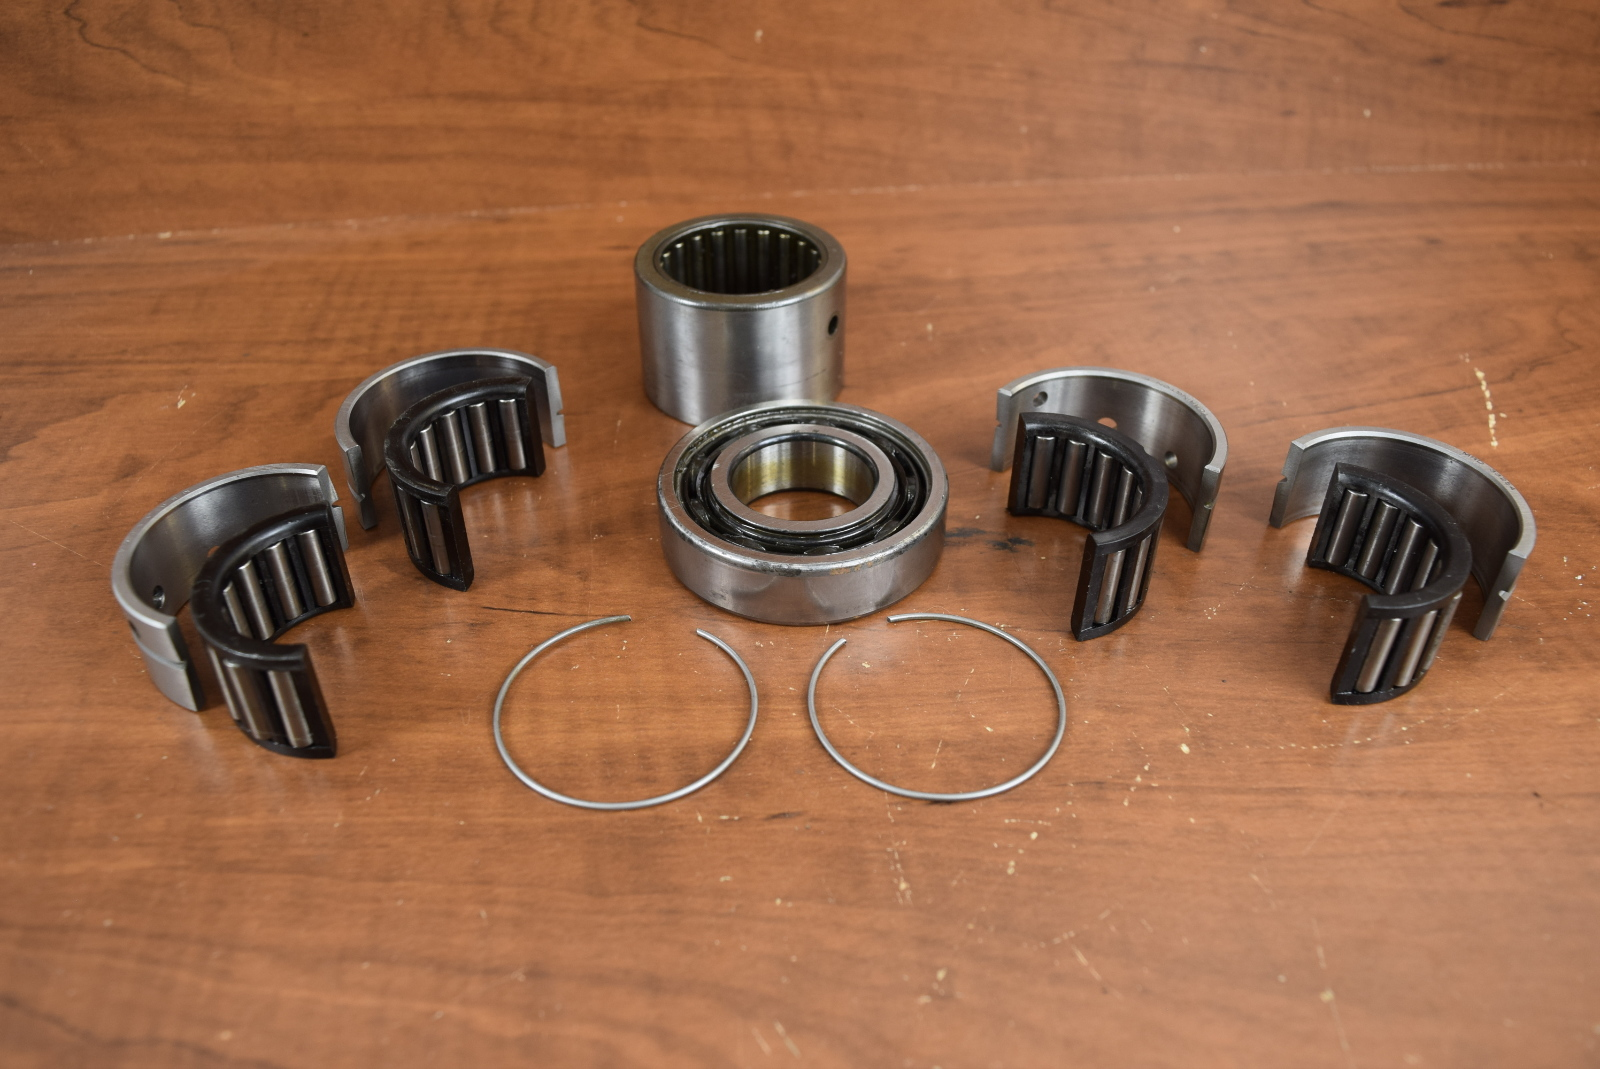 Johnson evinrude crankshaft bearing set 1987 2005 35 40 45 for Motor bearing cross reference